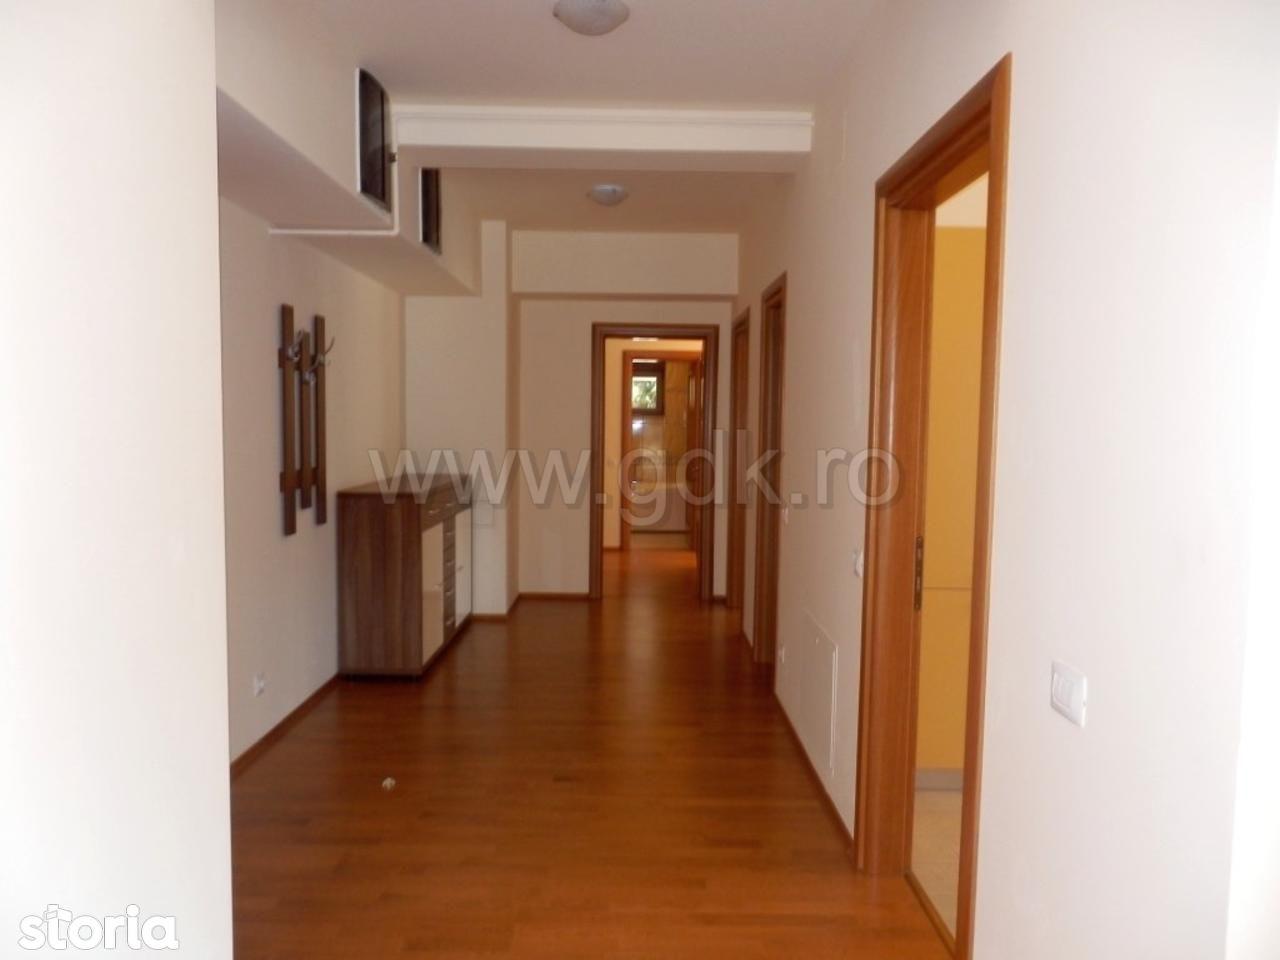 Apartament de inchiriat, București (judet), Strada Căpitan Gheorghe Calpan - Foto 9